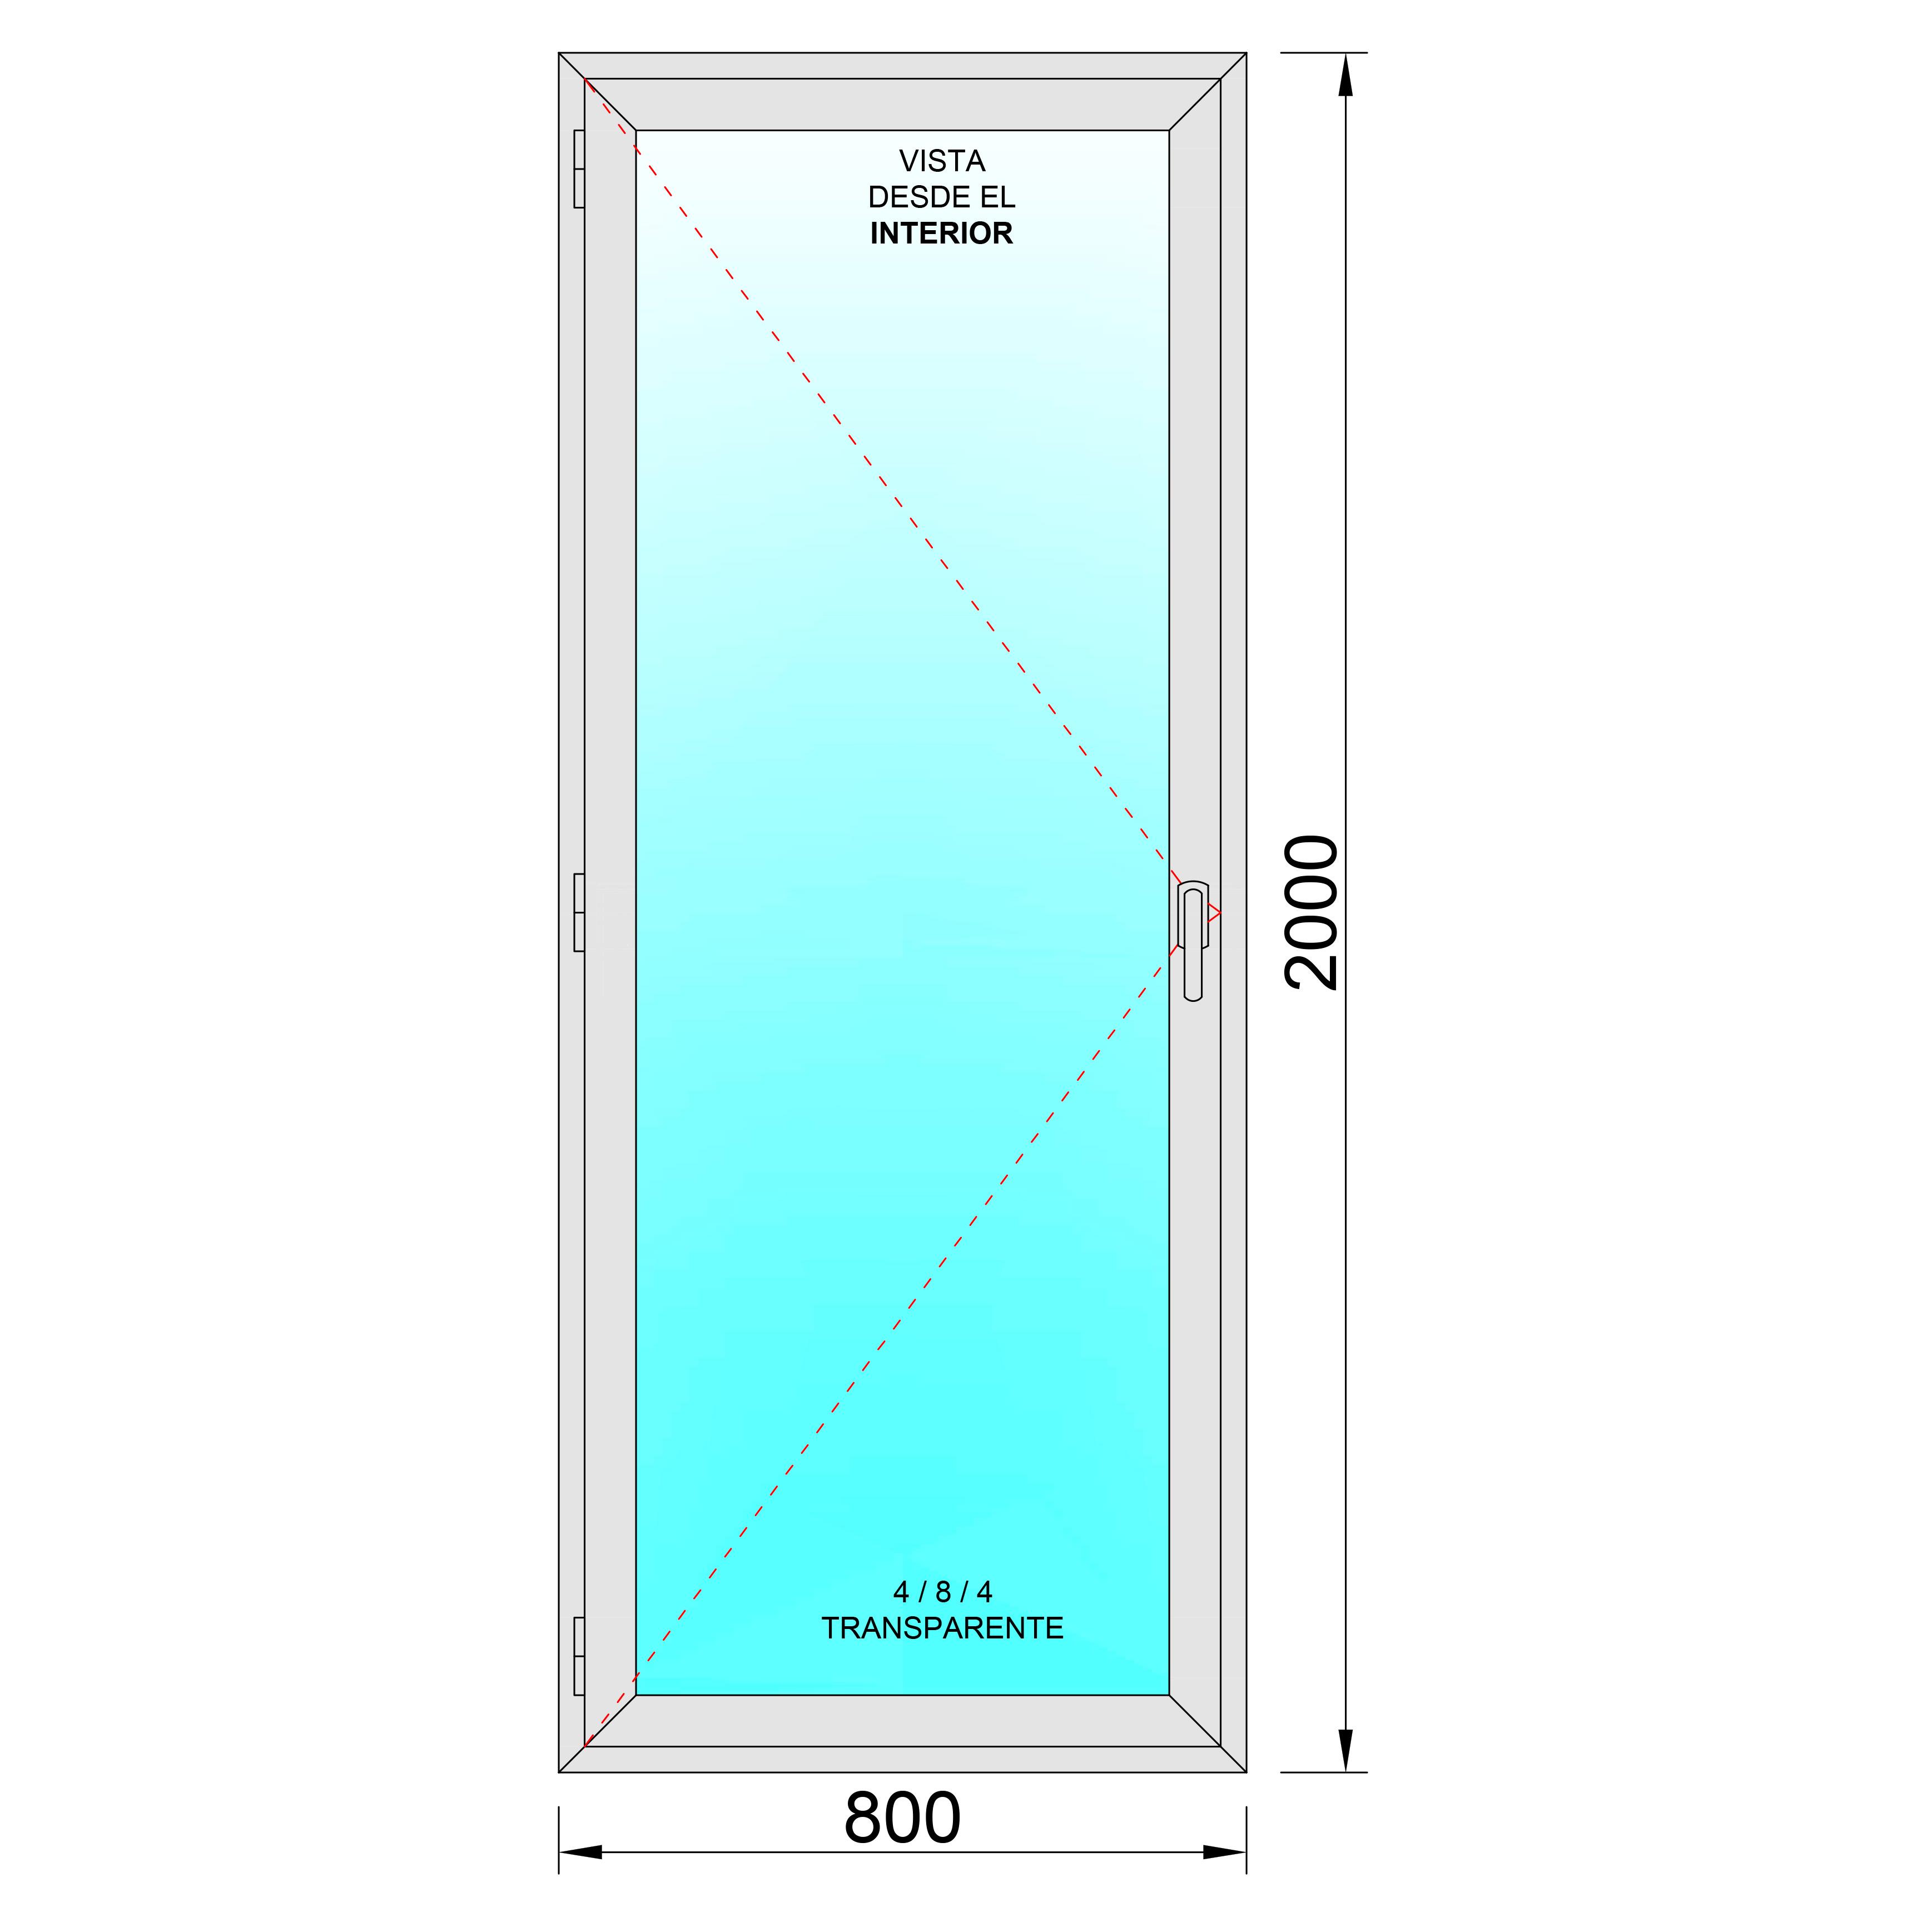 Puerta balconera aluminio practicable izquierda 800x2000 - Puerta balconera aluminio ...